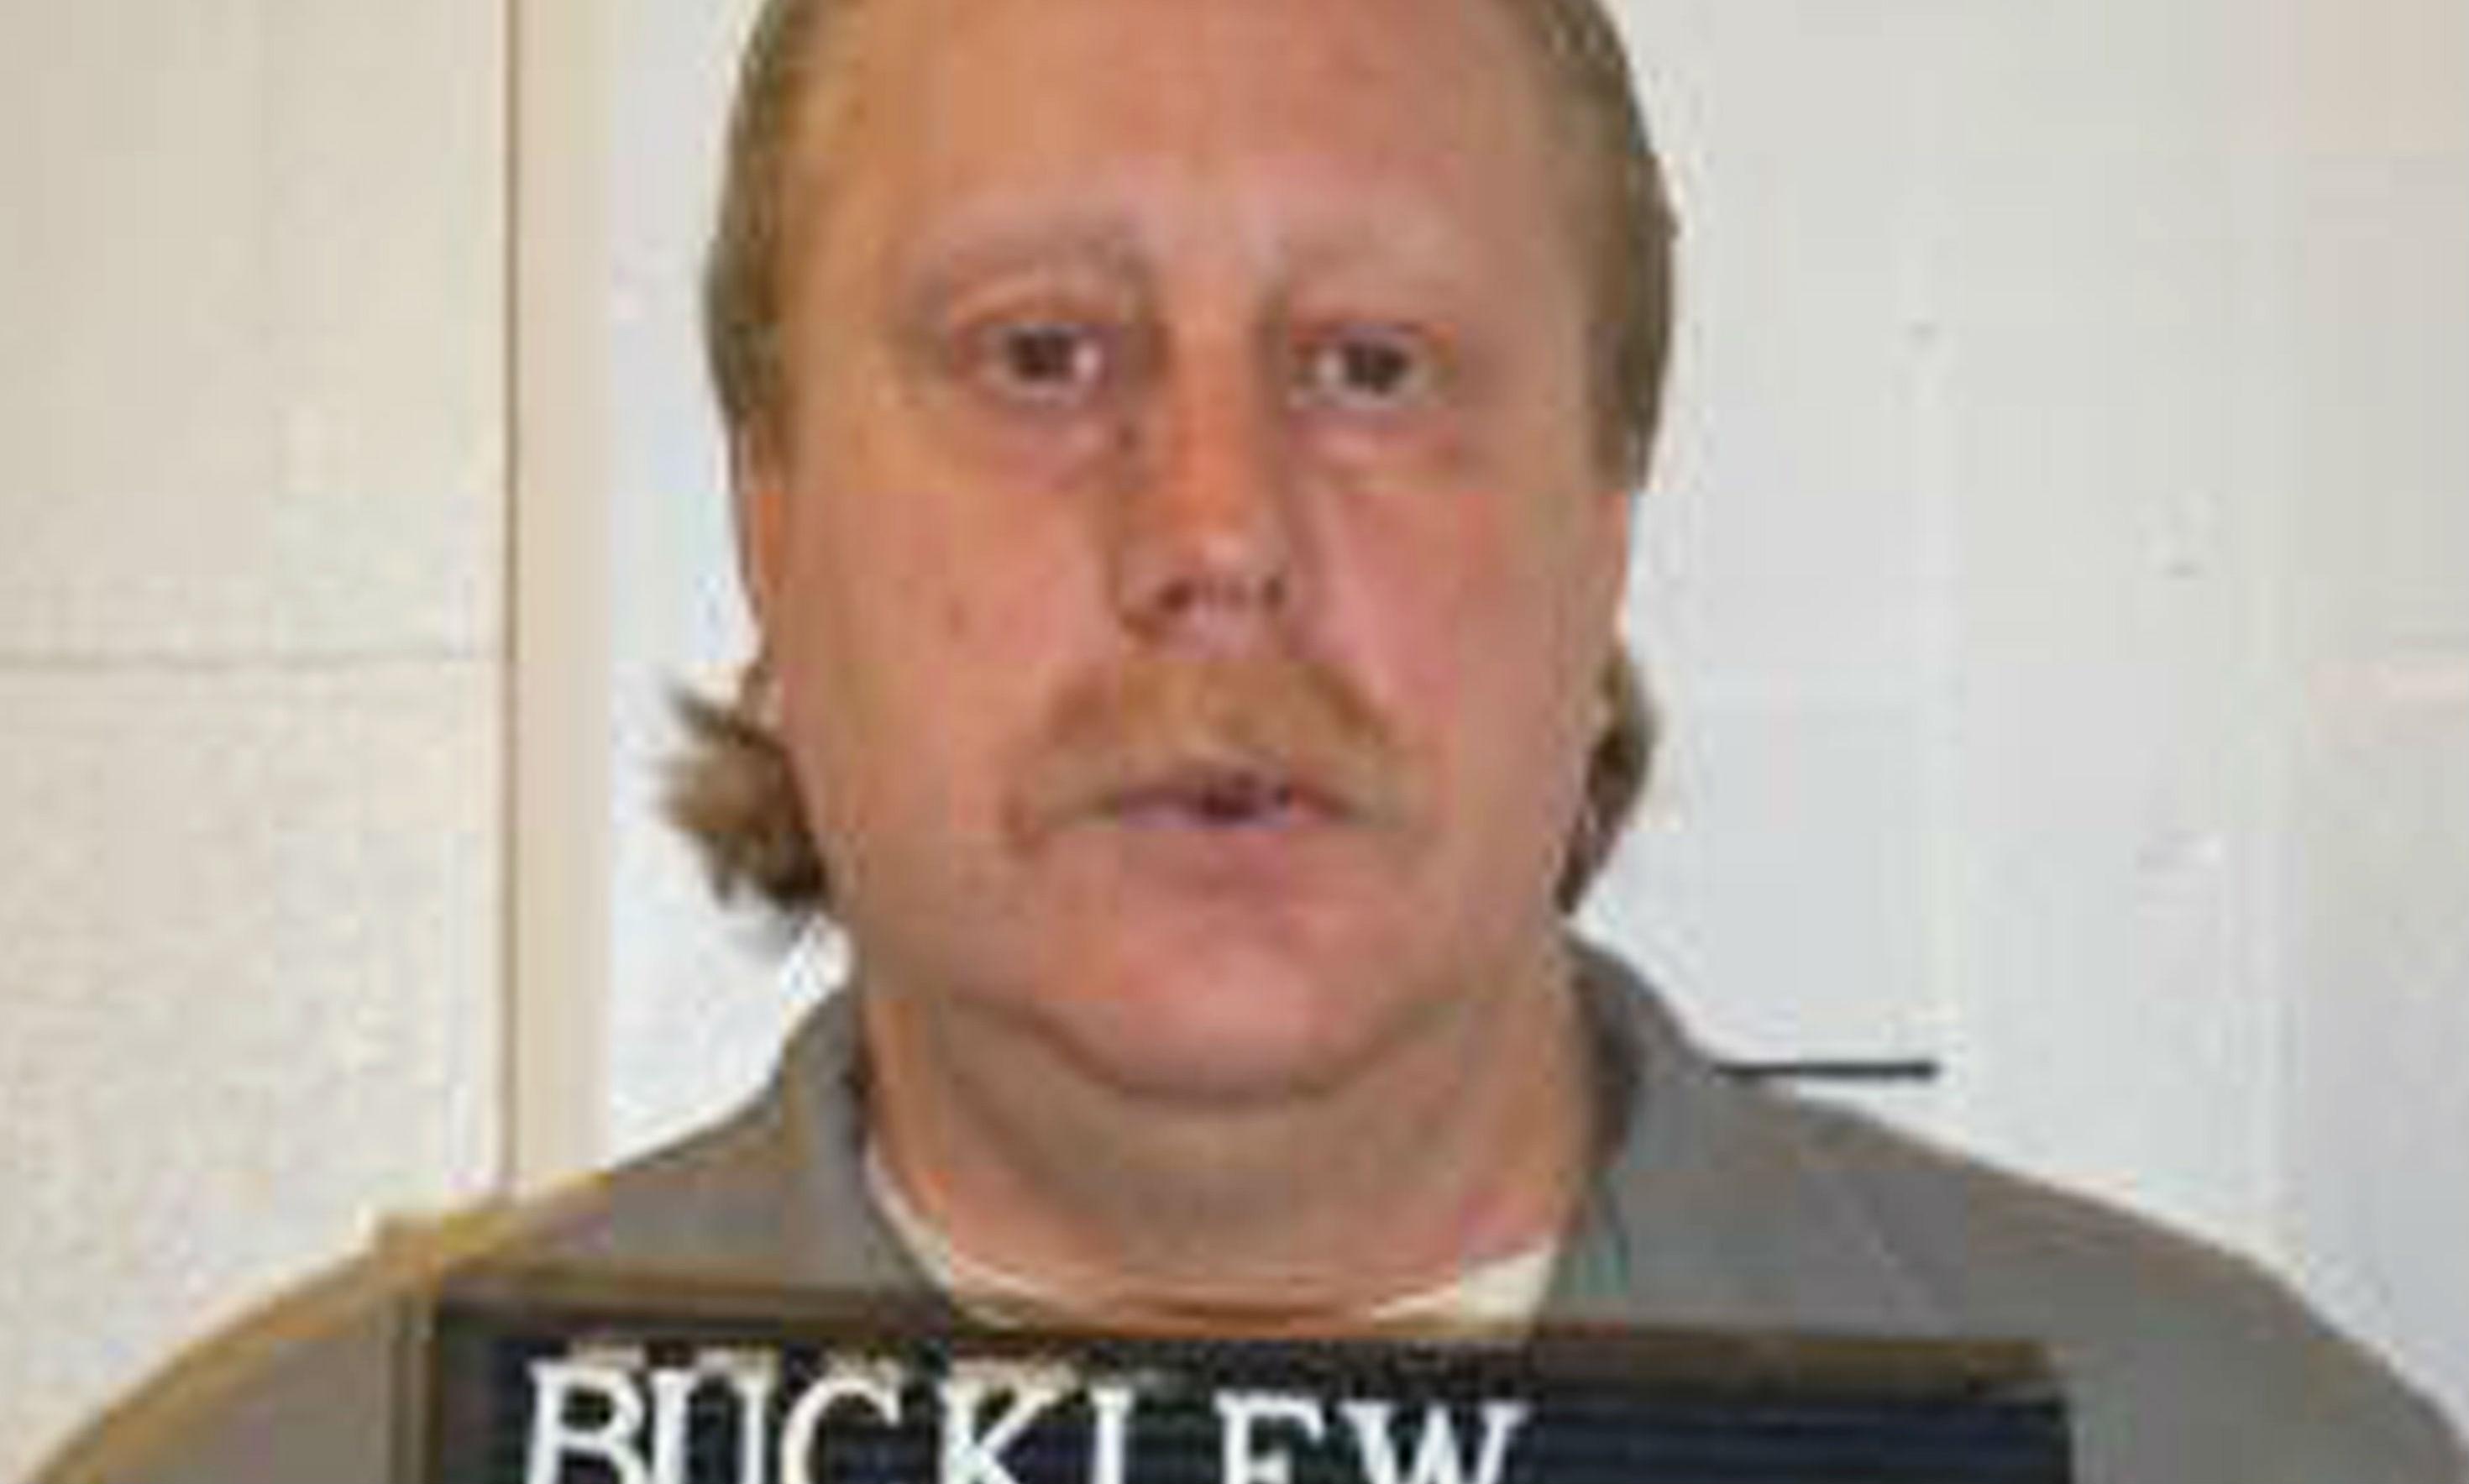 Russell-Bucklew-AP-ImagesMissouri-Department-of-Corrections